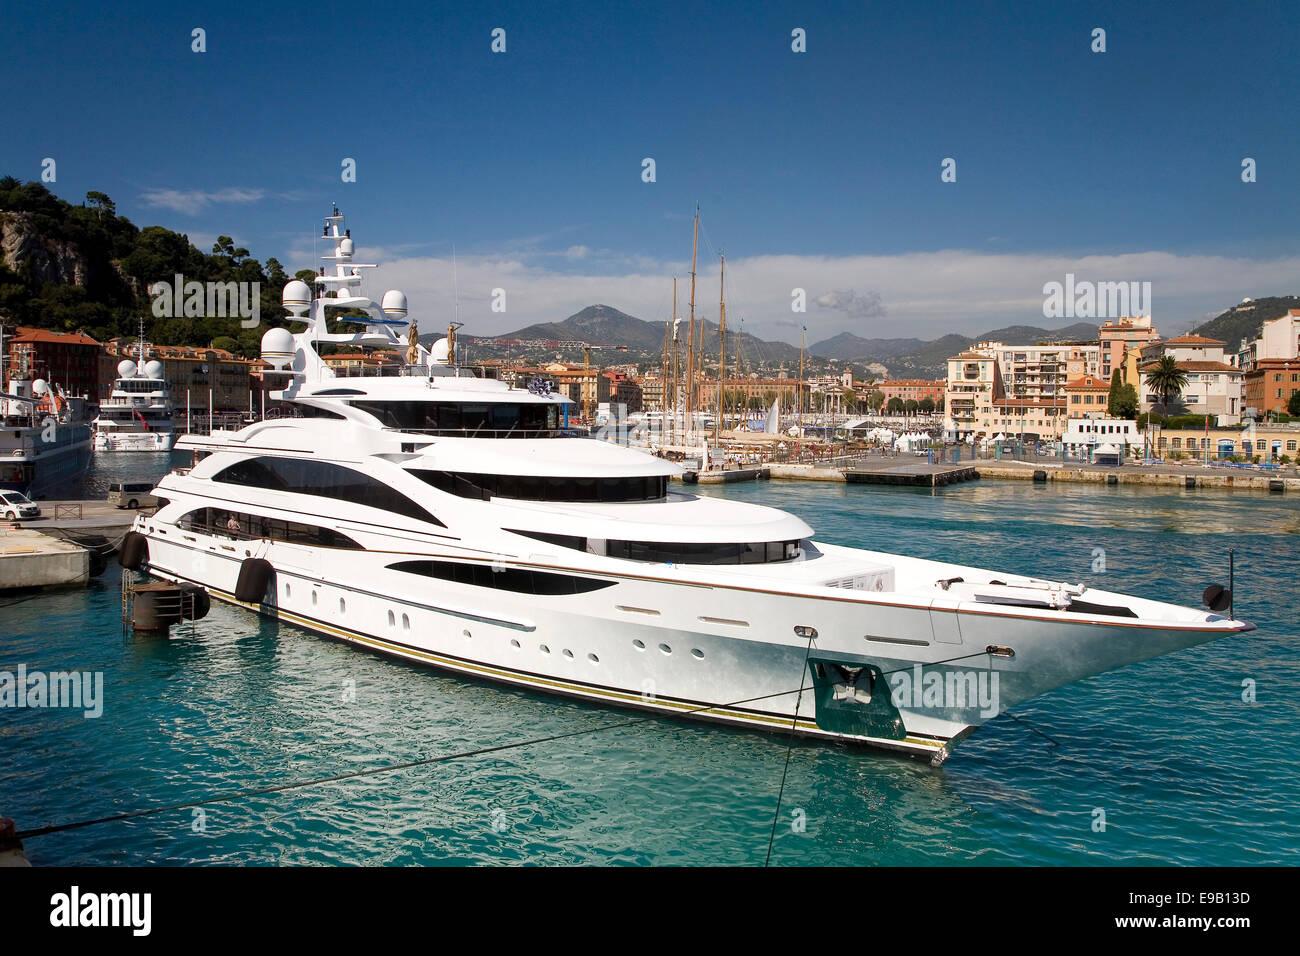 Luxury yacht, harbour, Nice, Provence-Alpes-Côte d'Azur, France - Stock Image